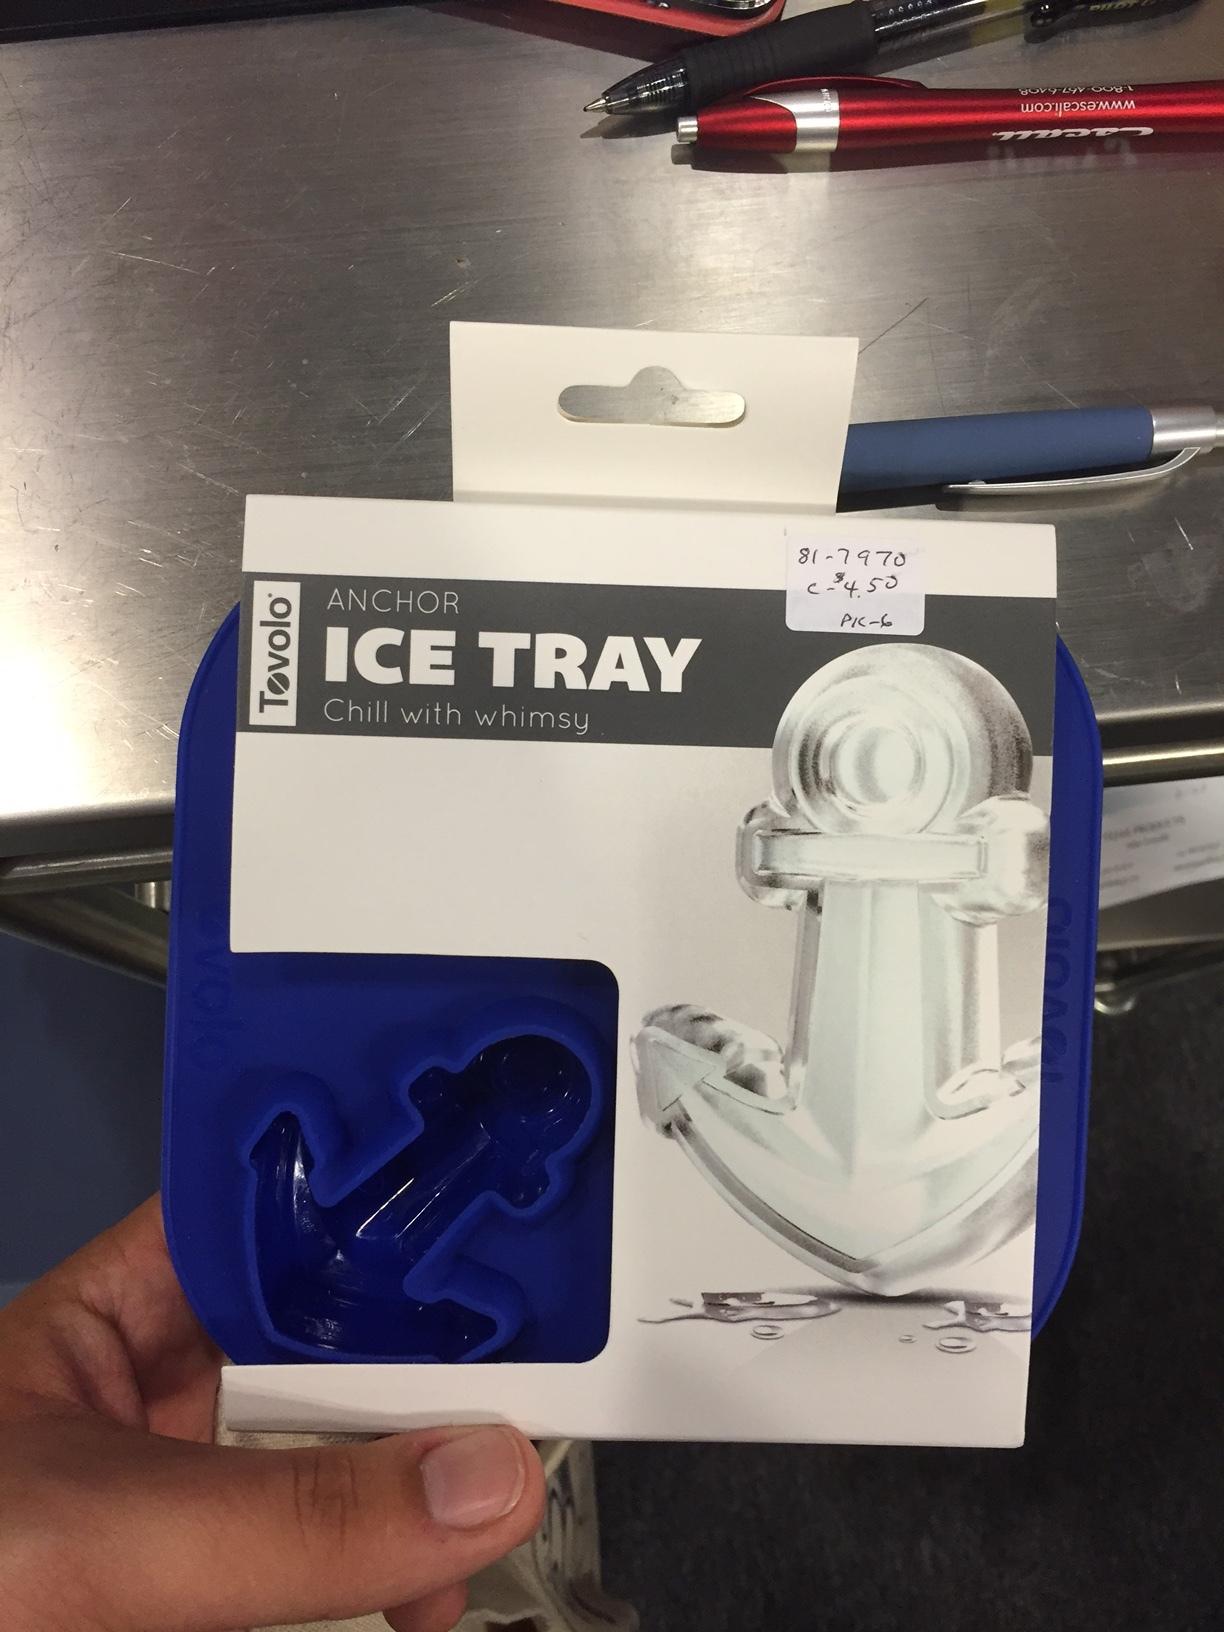 Tovolo: Novelty Ice Molds – Anchor